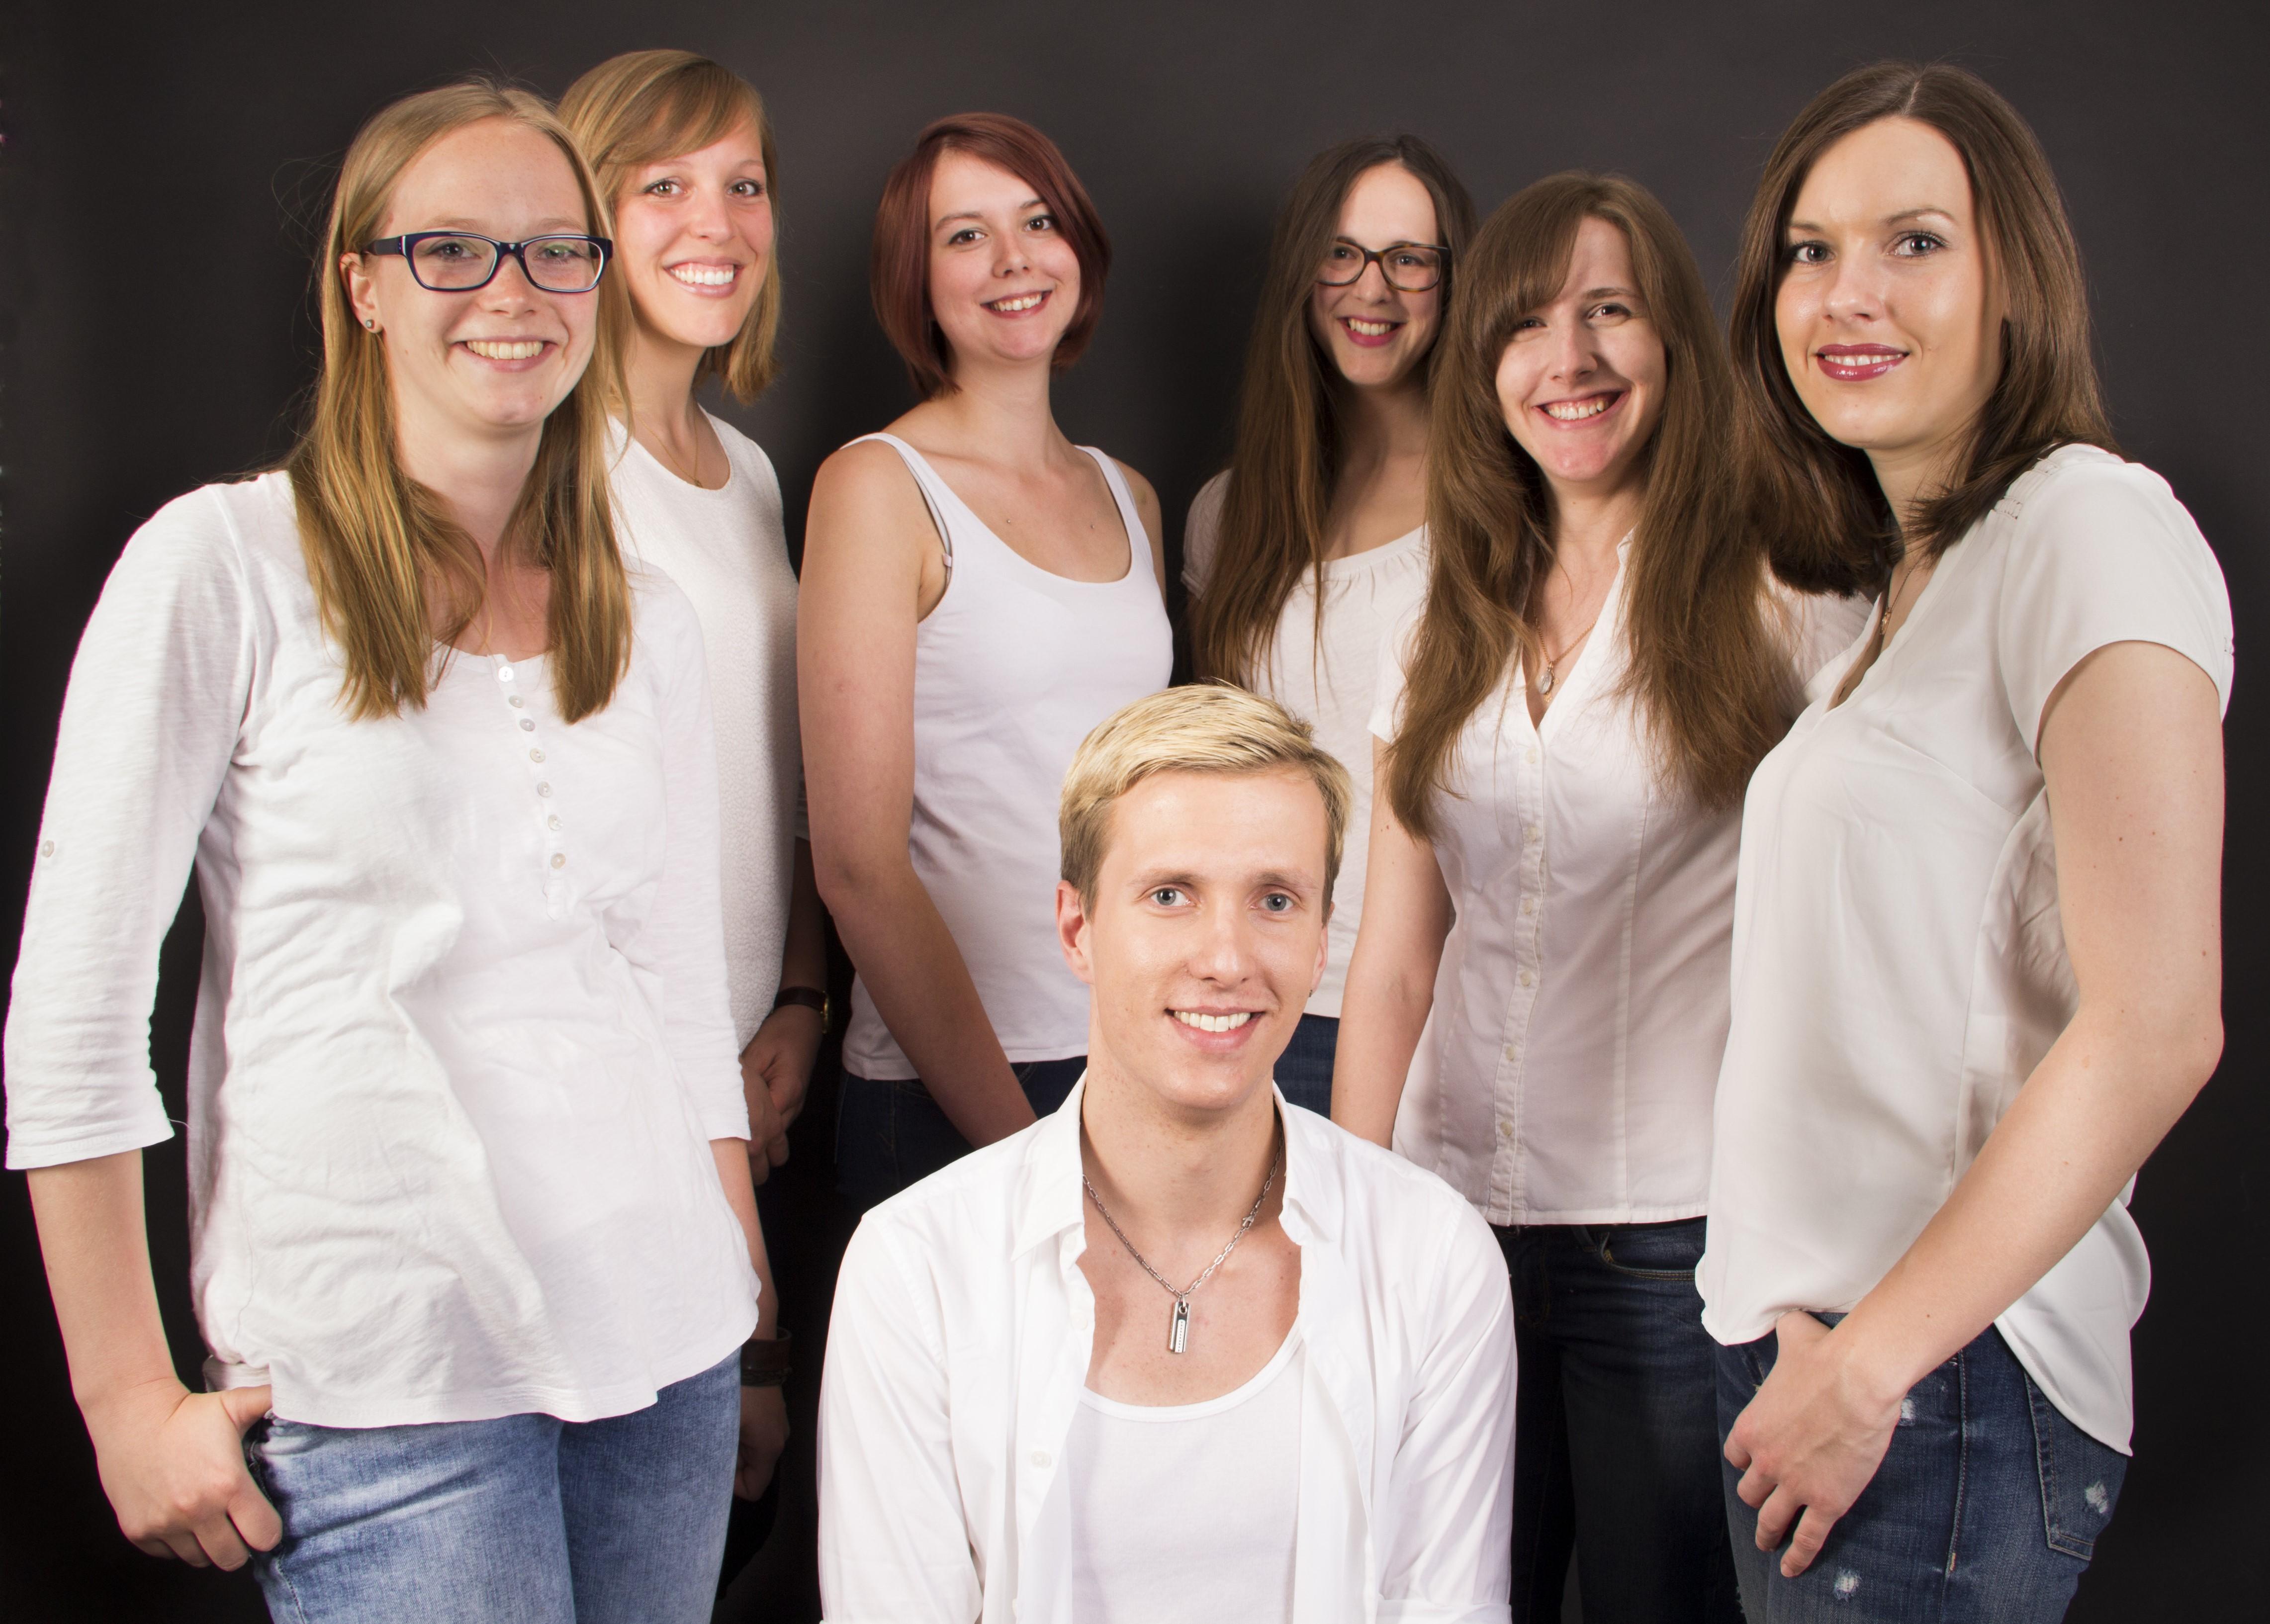 Von links nach rechts: Hilke Niemann, Wencke Siemßen, Lena Taudien, Danny Drefahl, Joanna Czerniawski, Yanina Murashova, Saskia Eisenhardt